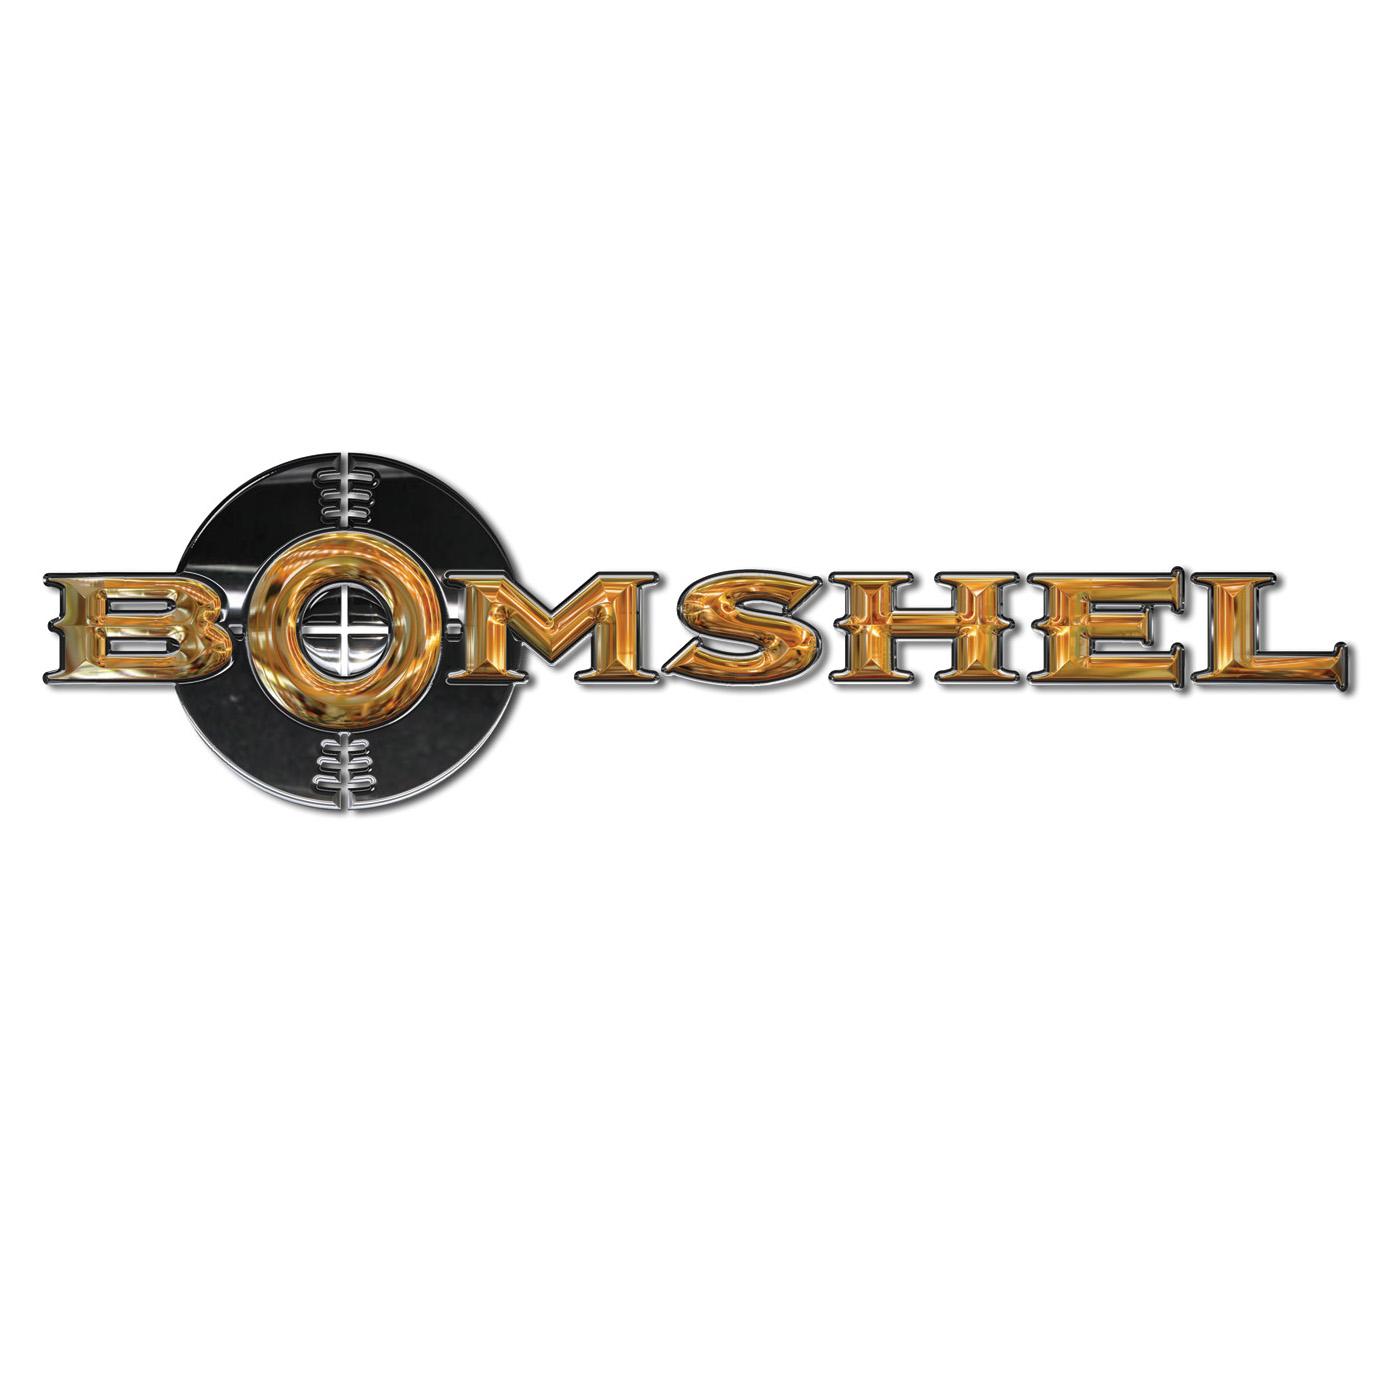 Bomshel metal logo flat .jpg